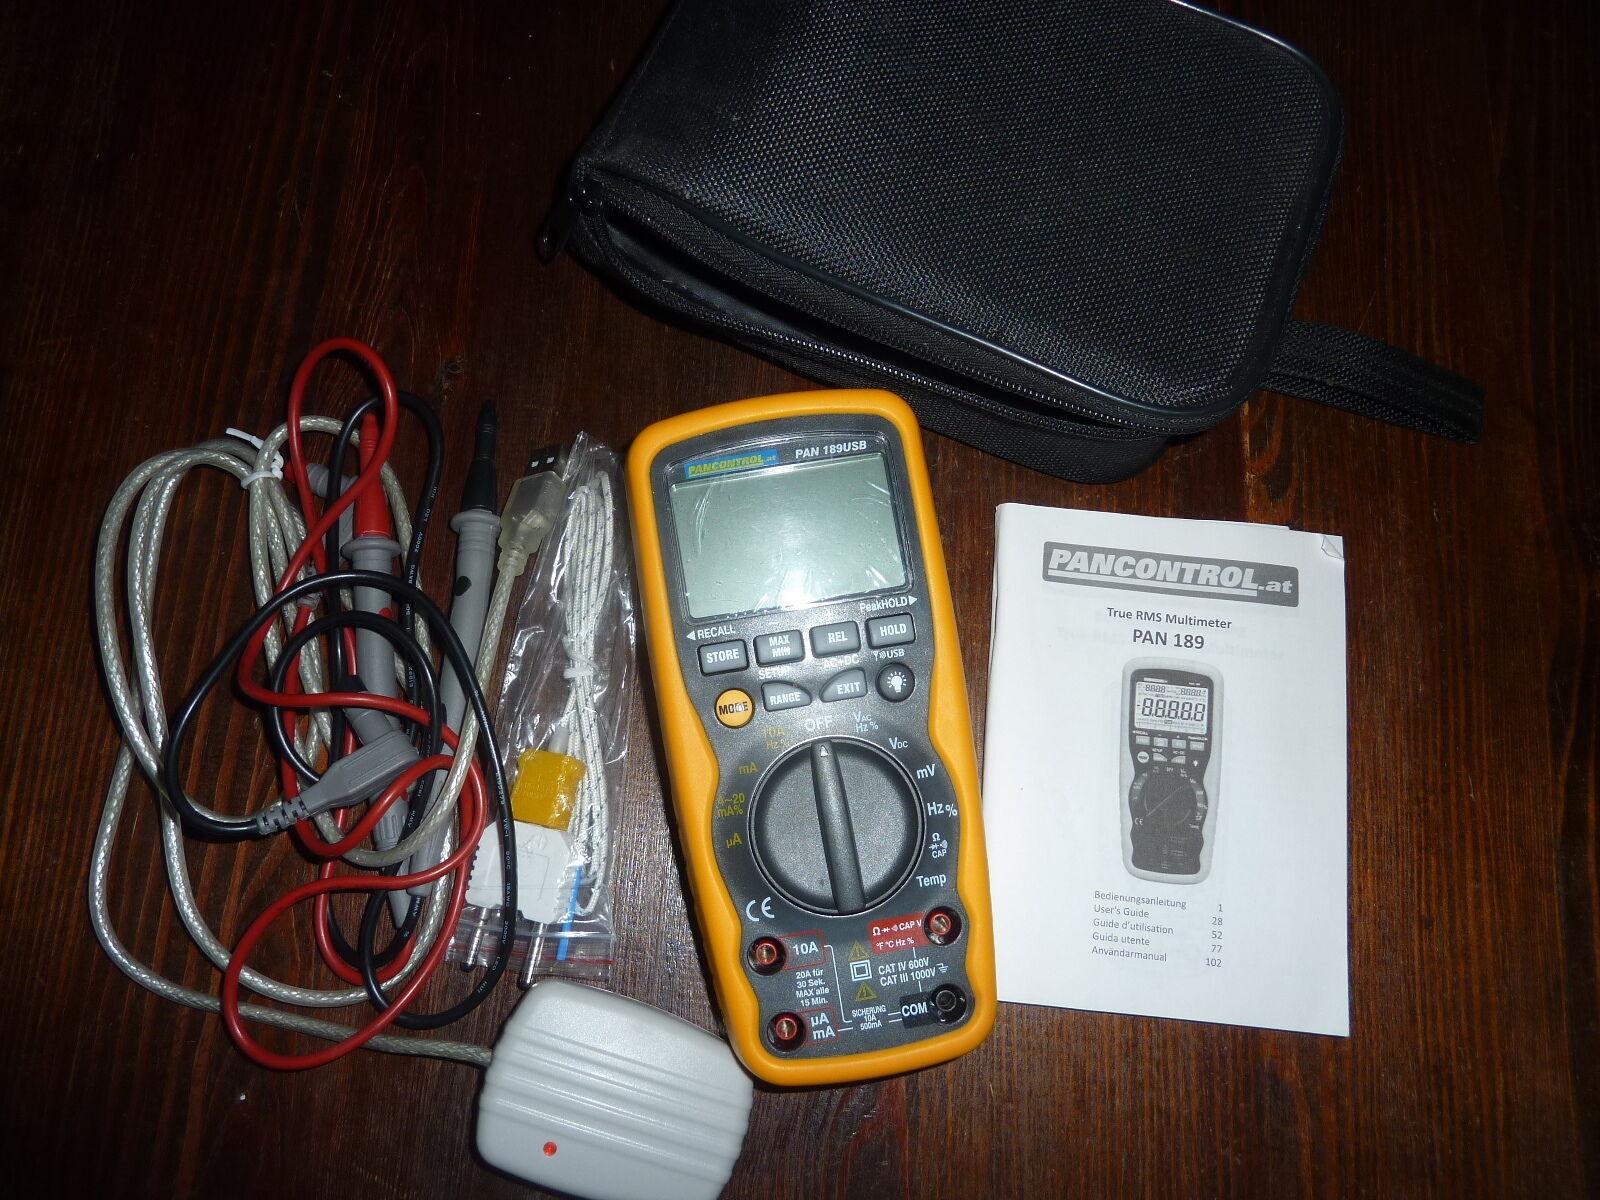 Pancontrol Digitalmultimeter, PAN 189 Messgerät